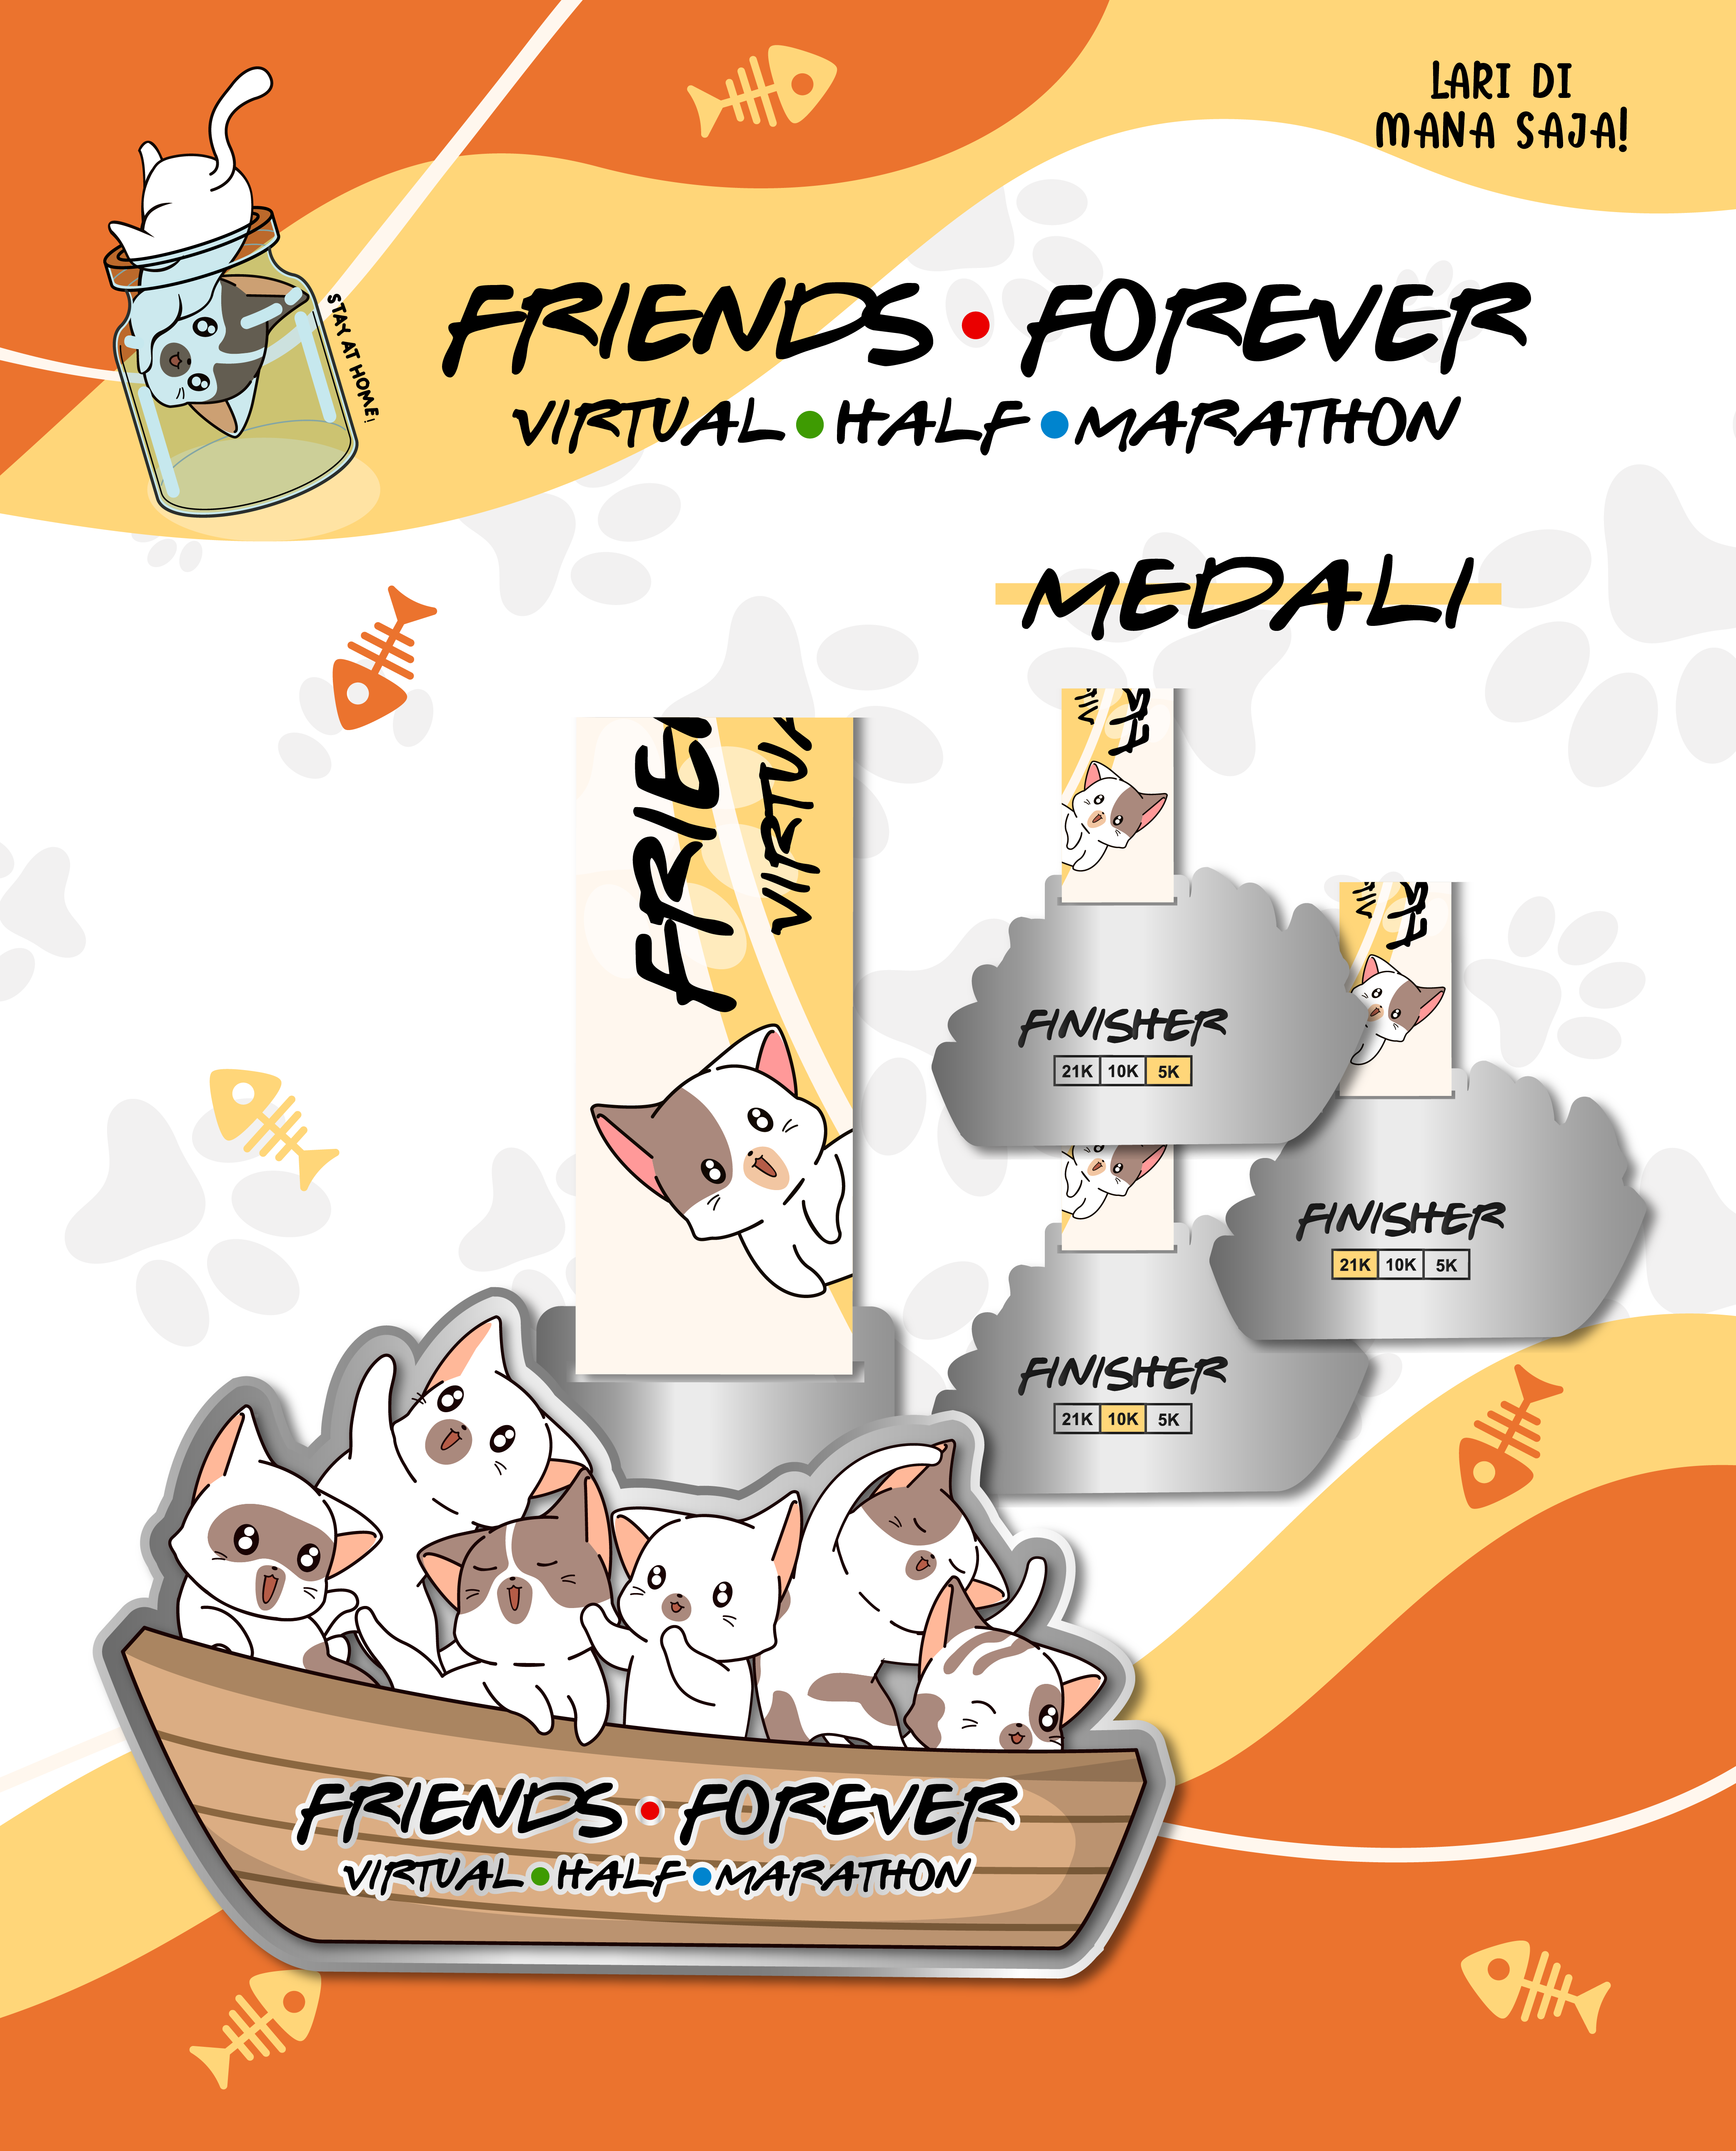 Friends Forever Virtual Half Marathon - Indonesia